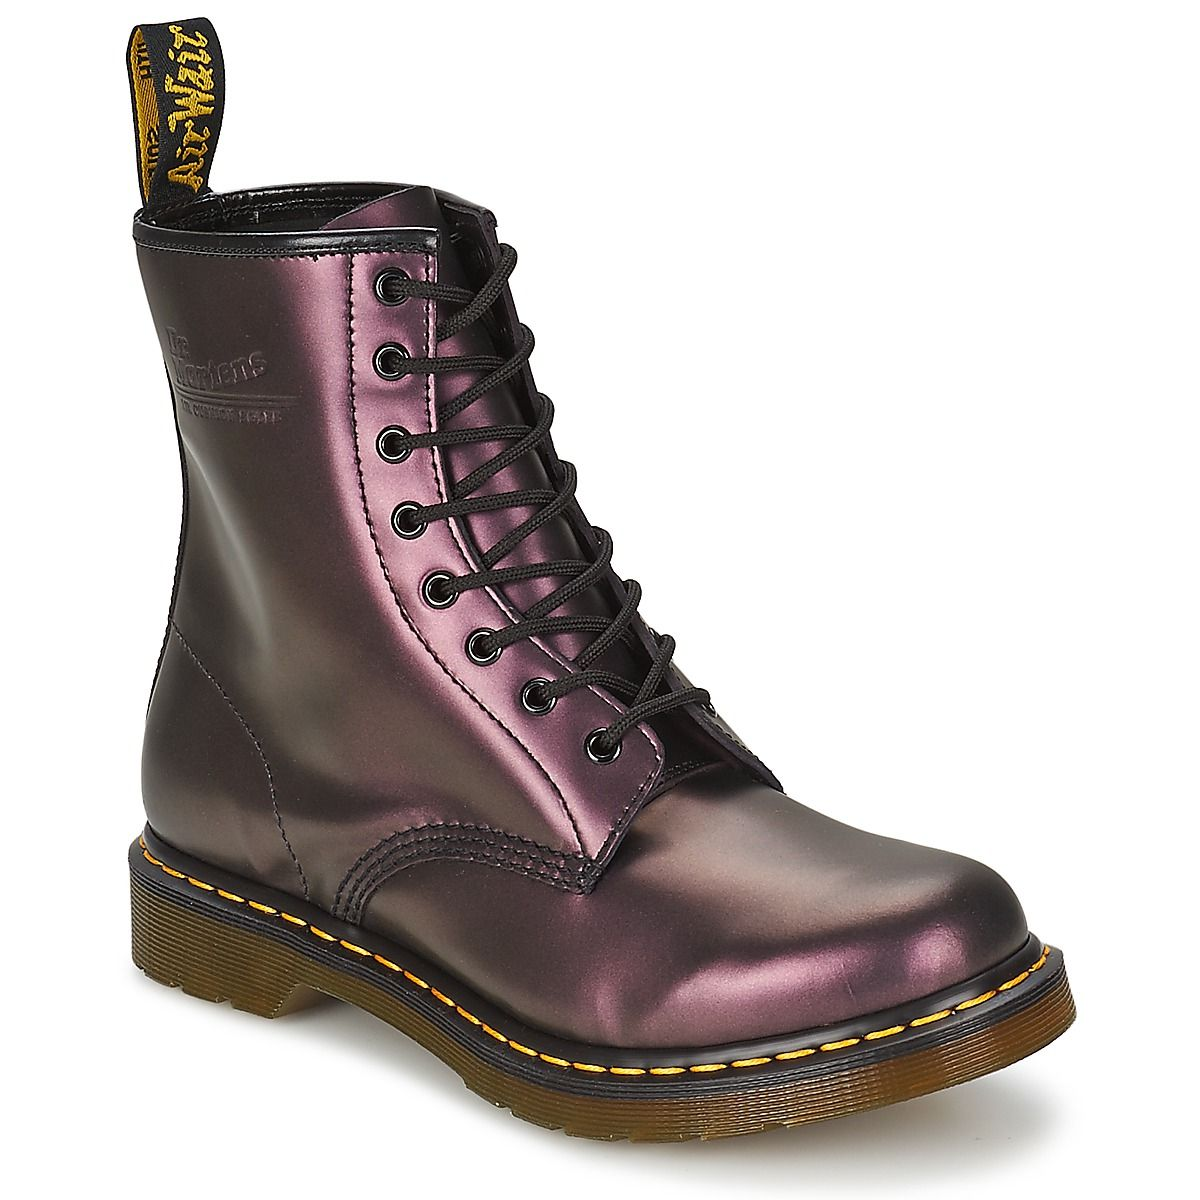 8018caba69f Boots Dr Martens 1460 prune métallique - Boots Femme Spartoo in 2019 ...